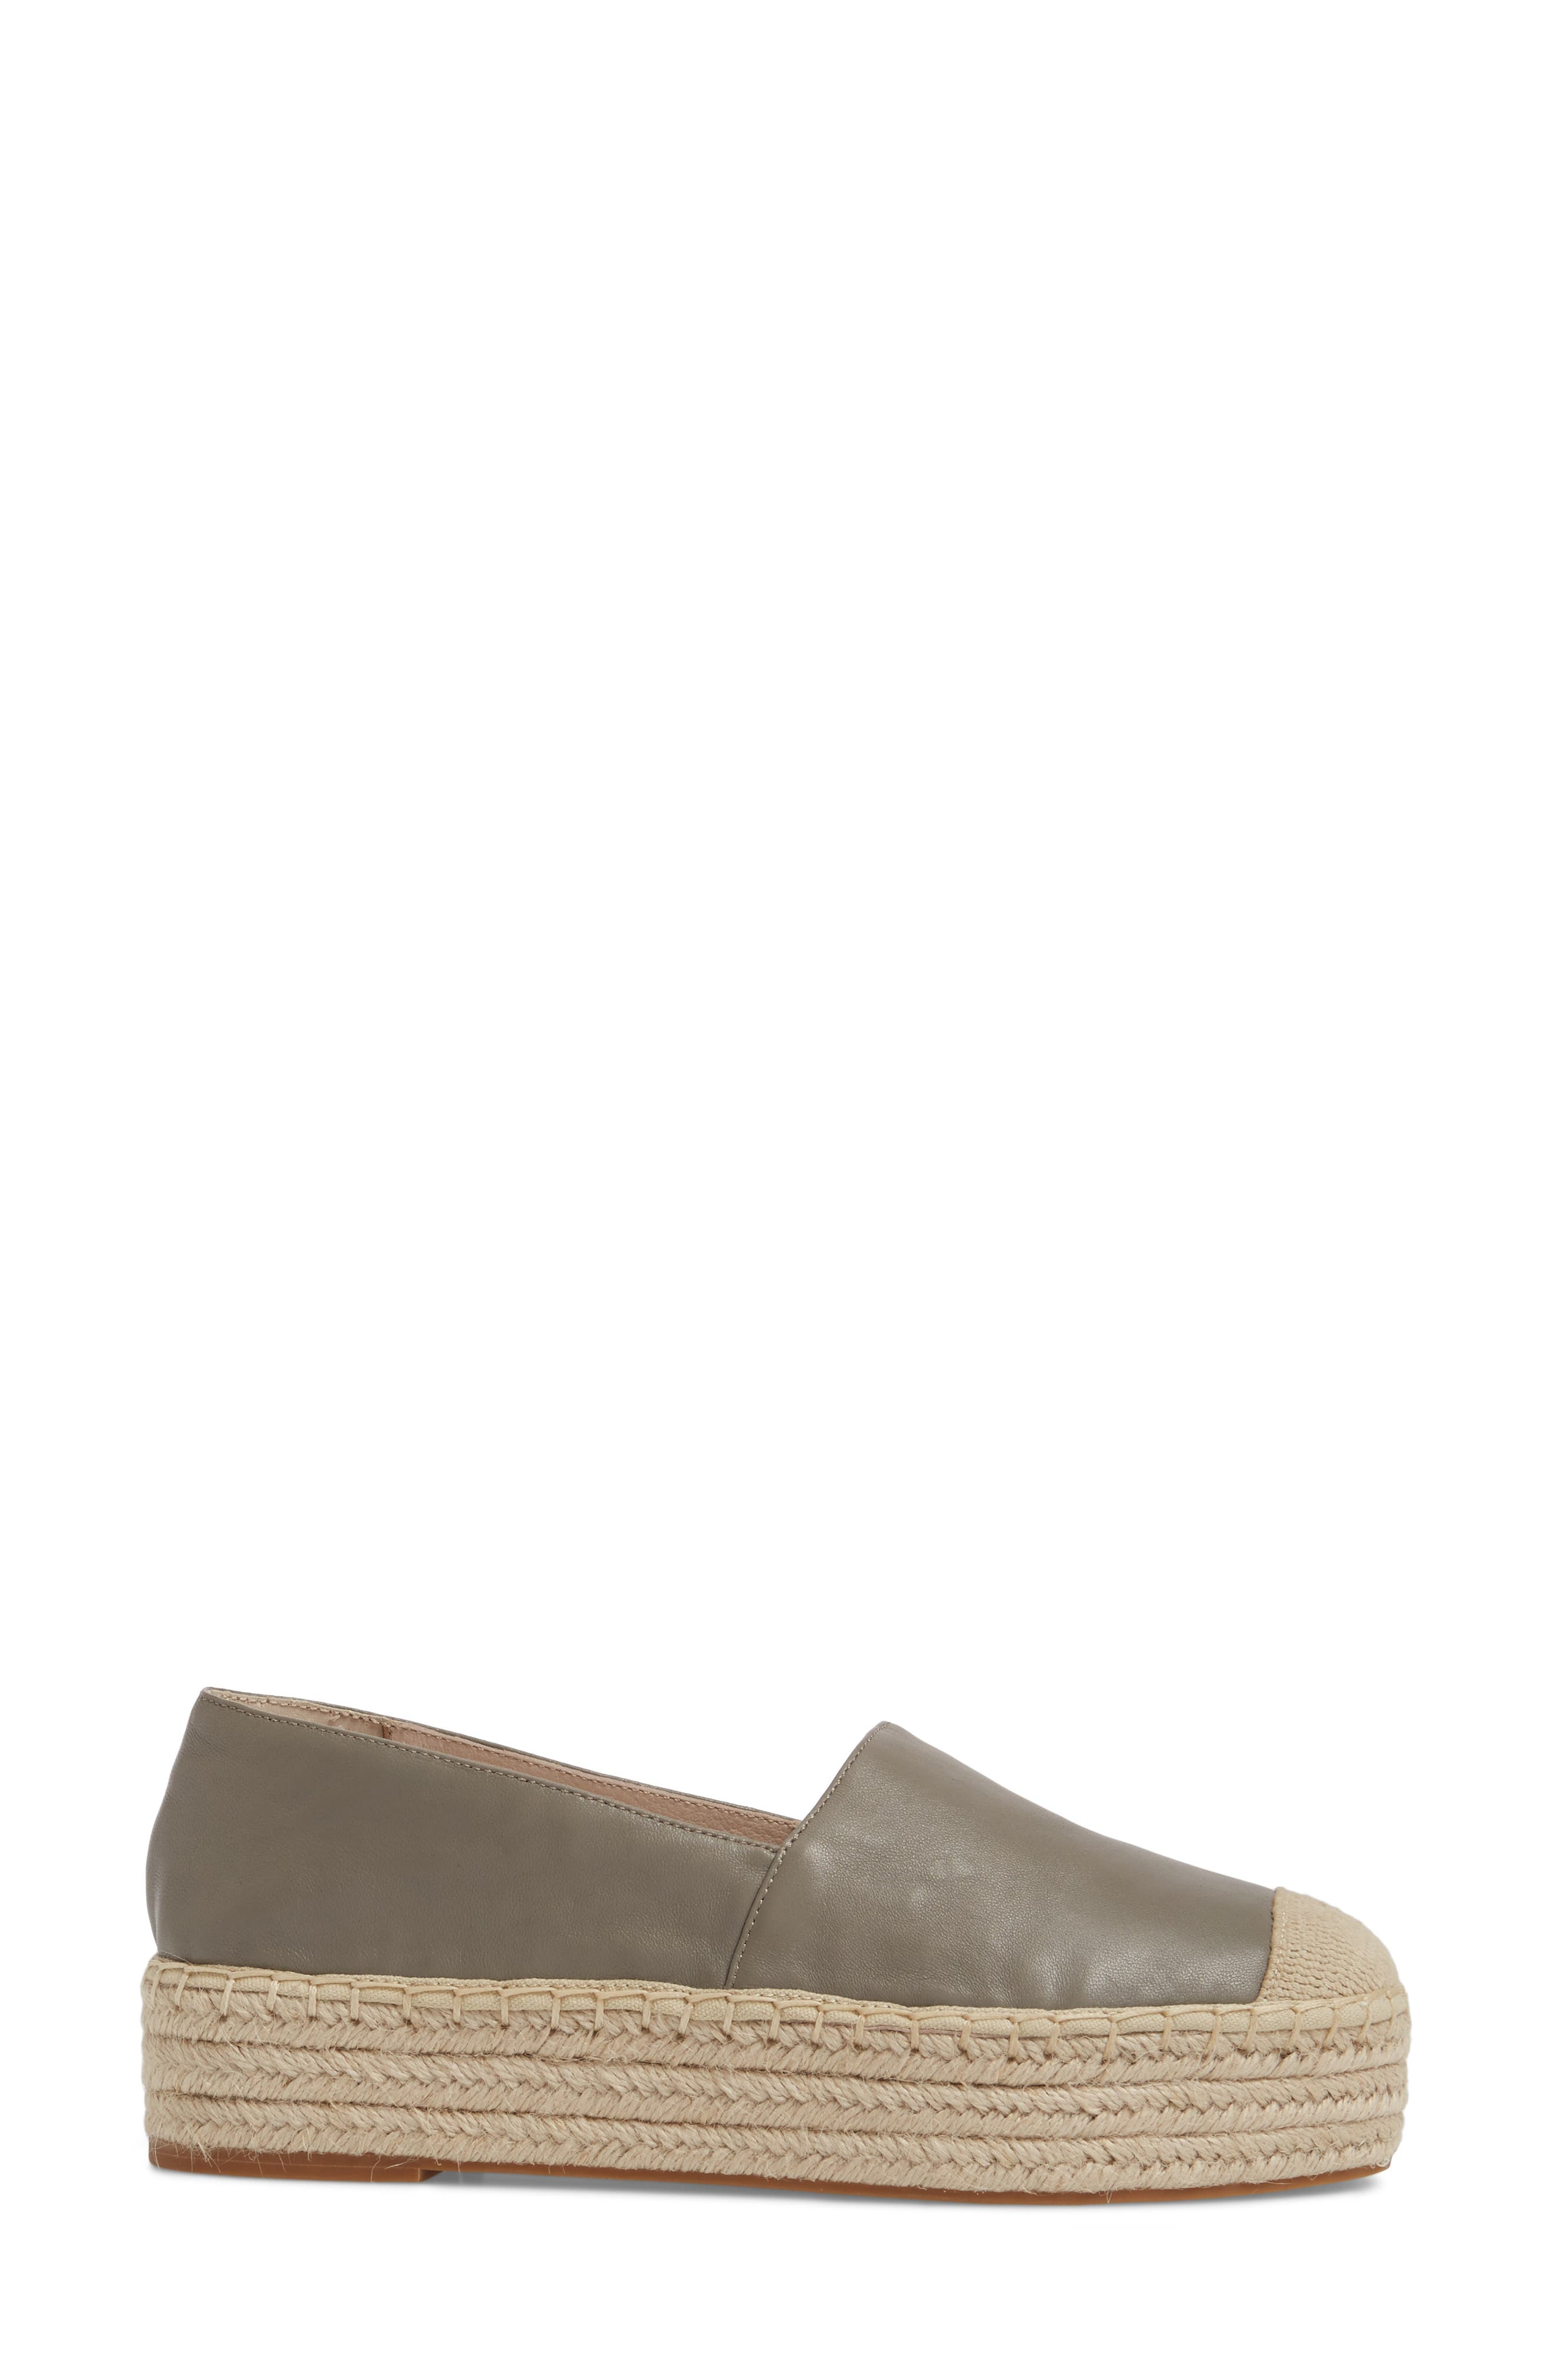 Collins Lea Espadrille Platform Slip-On,                             Alternate thumbnail 3, color,                             Grey Leather